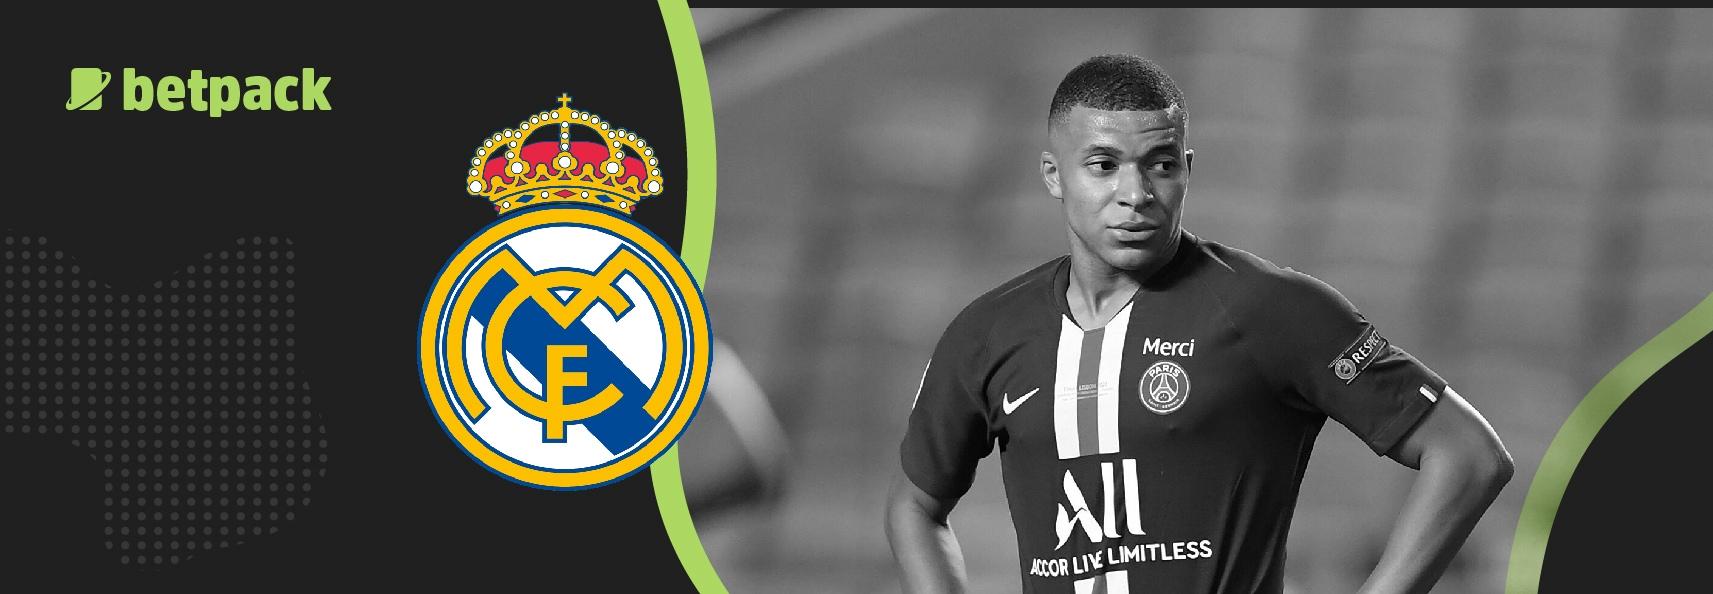 Real Madrid fail with €200m for Kylian Mbappé